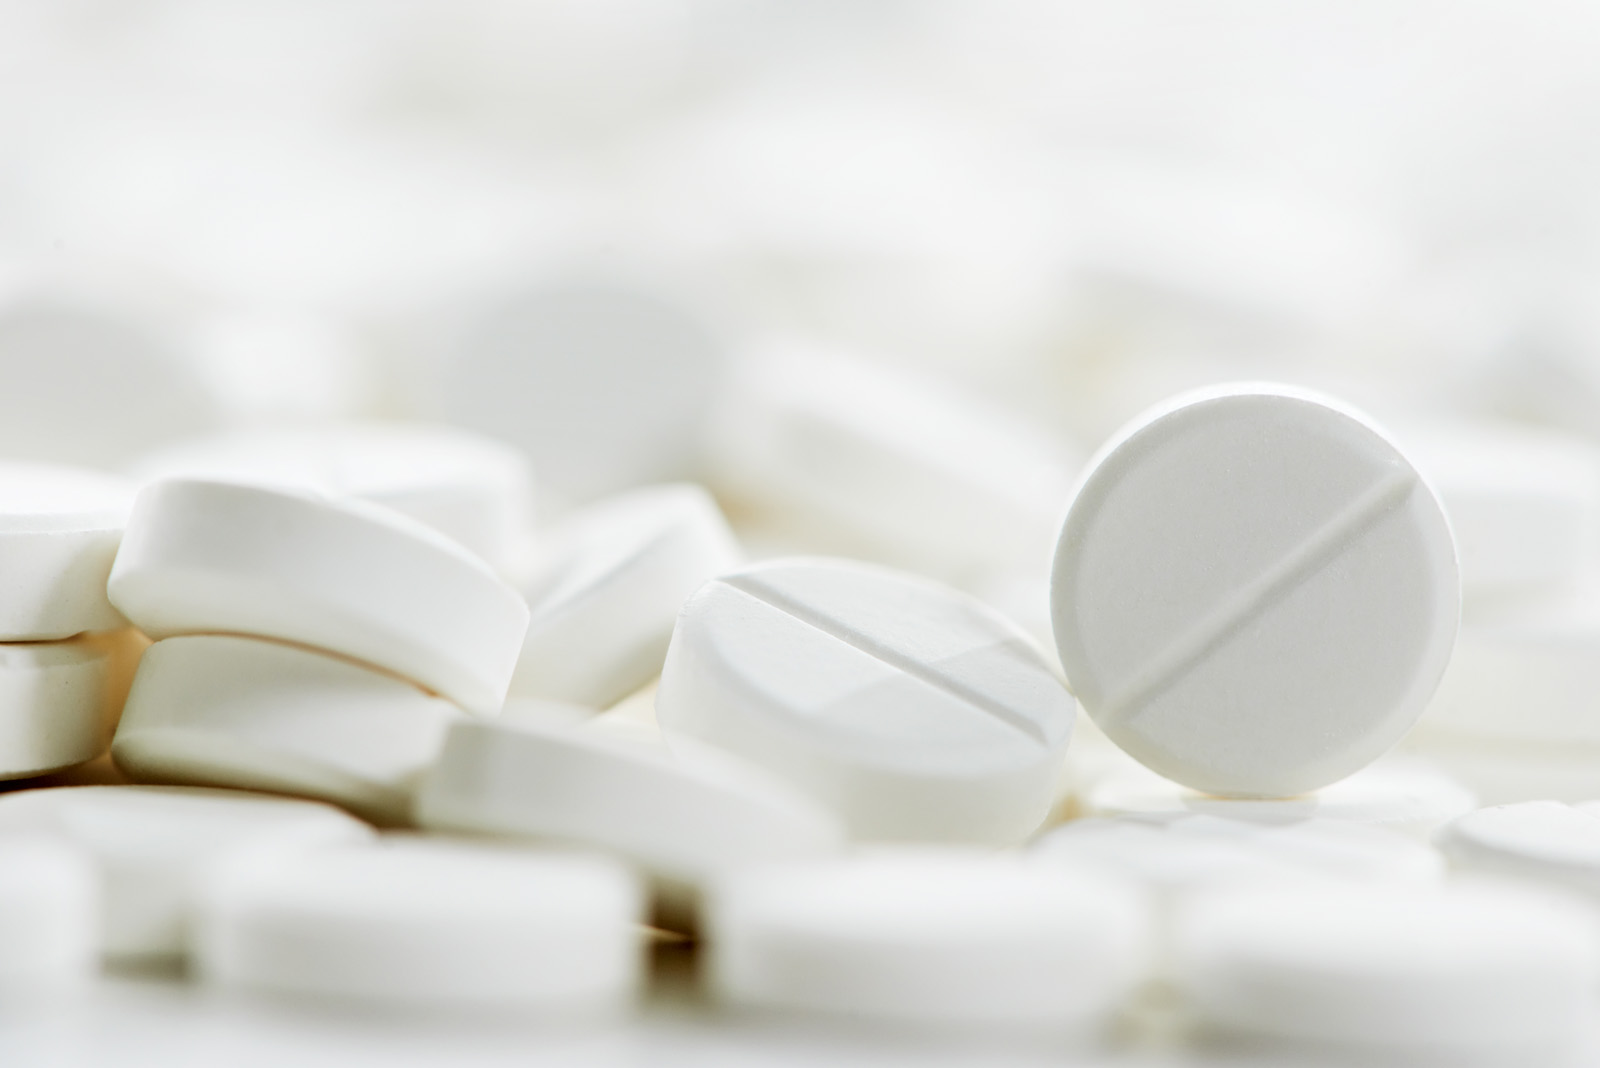 aspirina poza multe pastile